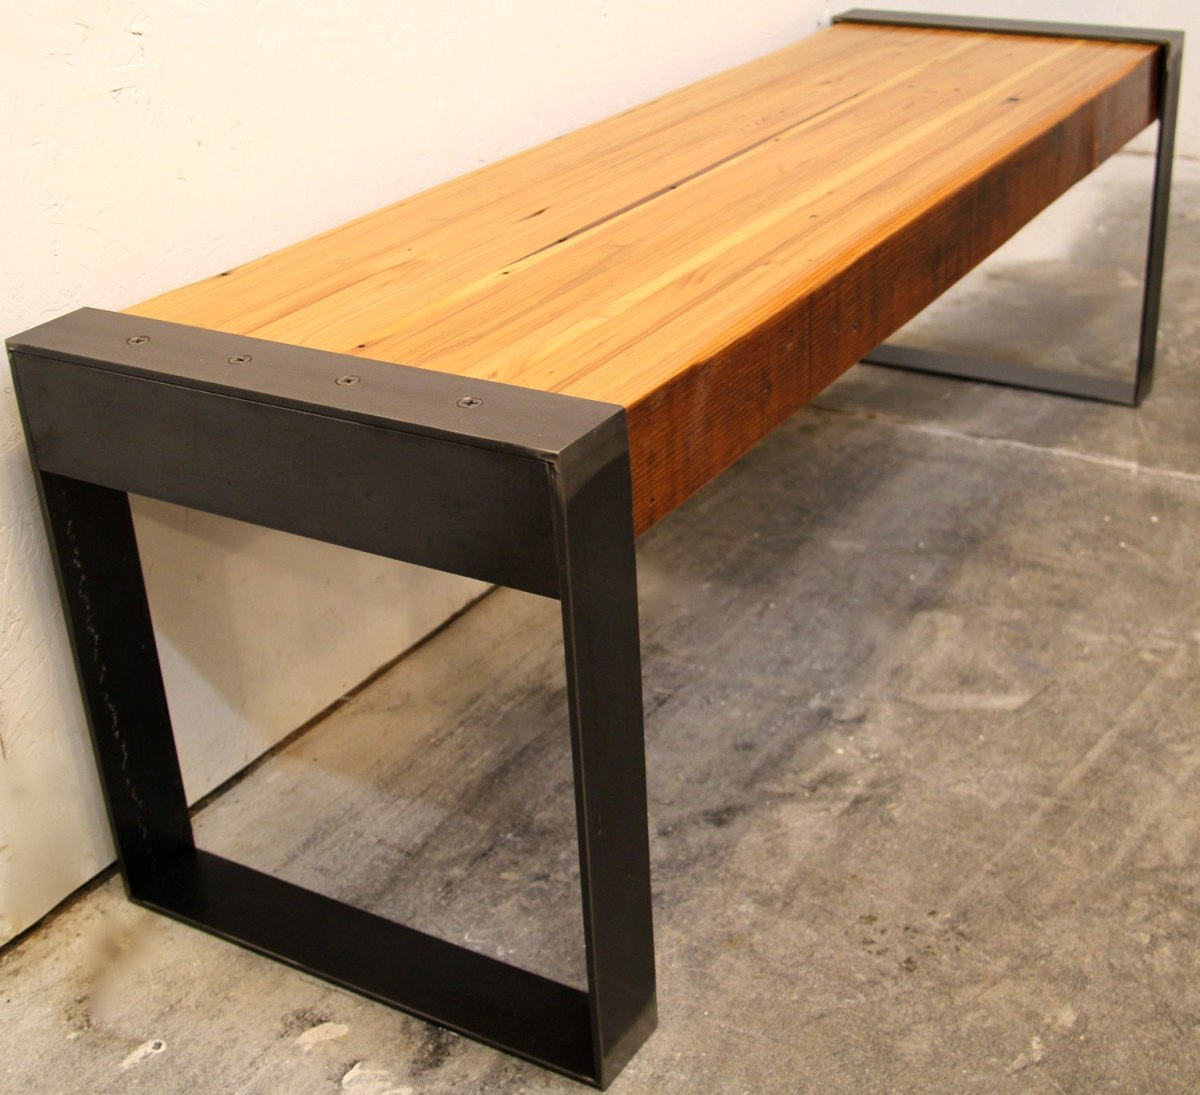 Banca madera metal jardin parque decoracion mesa comoda for Mesa banco madera jardin